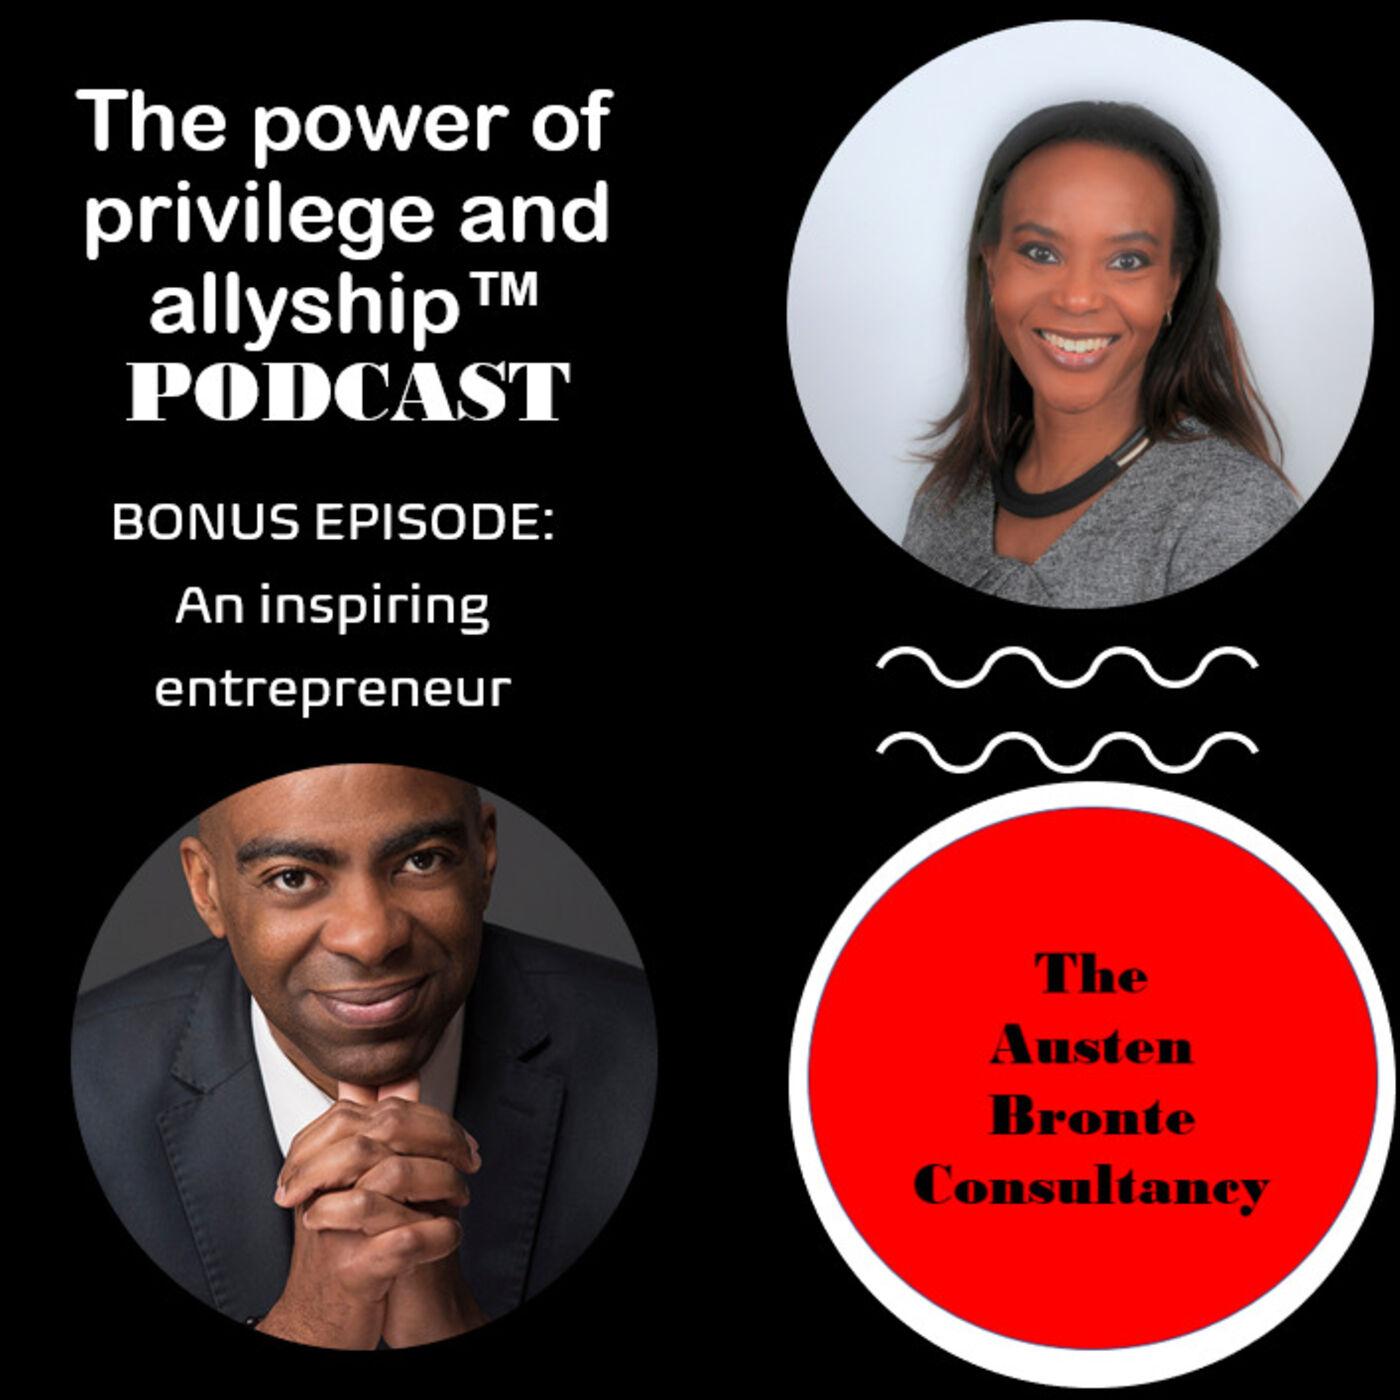 S1 BONUS EPISODE: An inspiring entrepreneur feat. Dayo Sowunmi